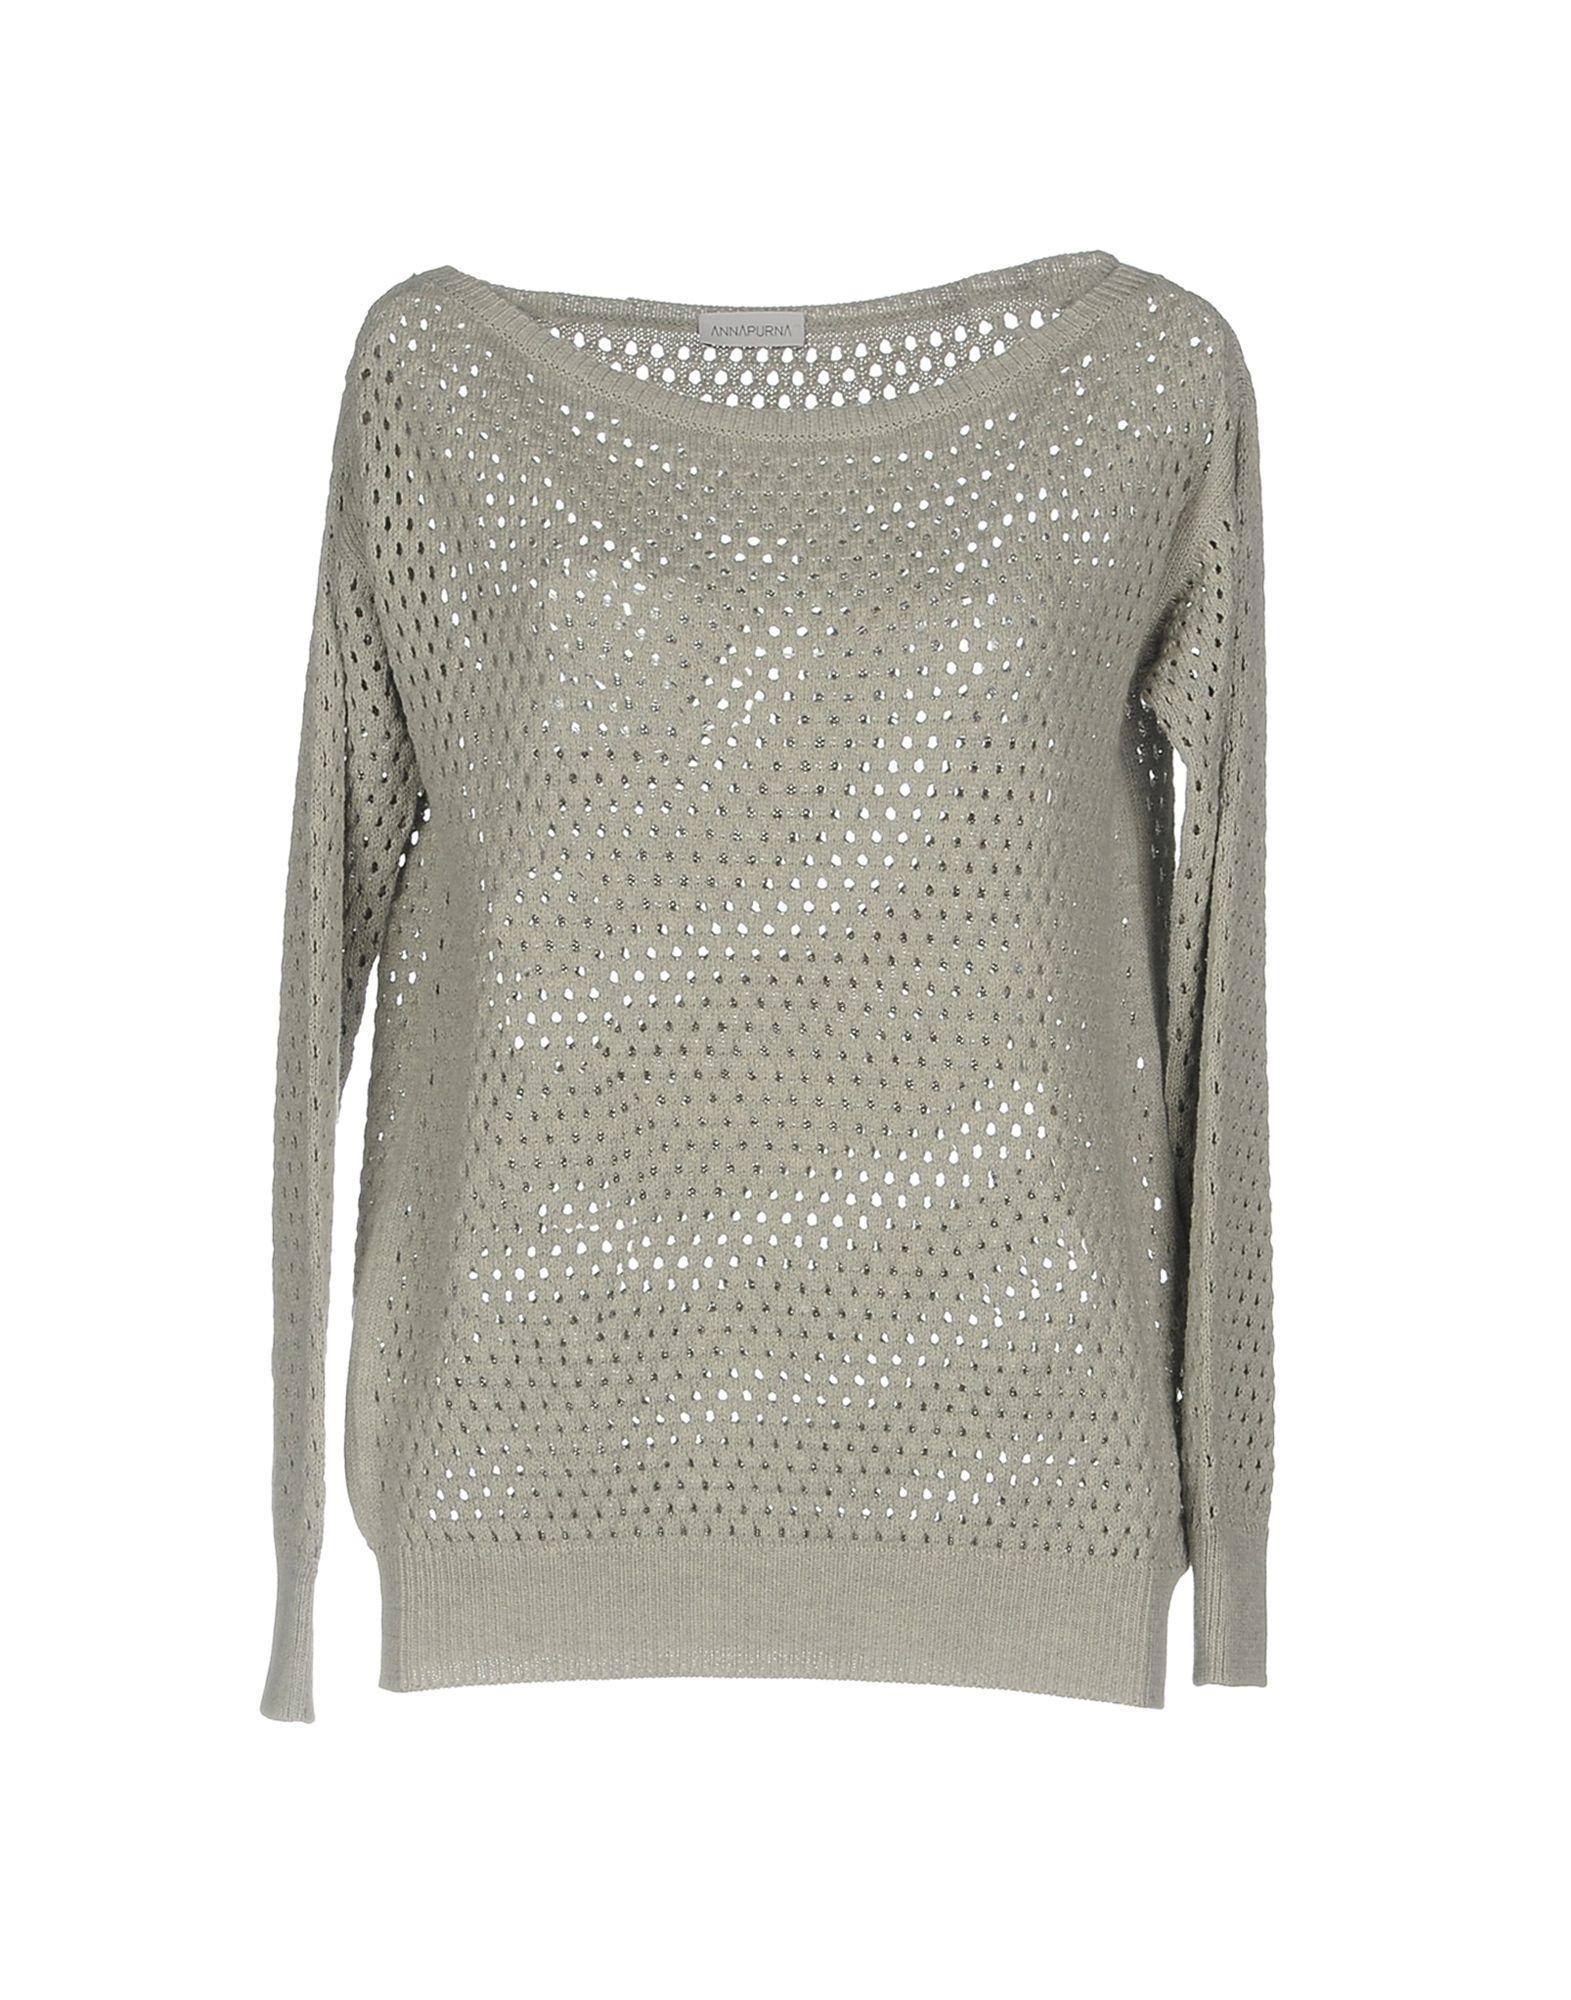 ANNAPURNA Sweater in Light Grey